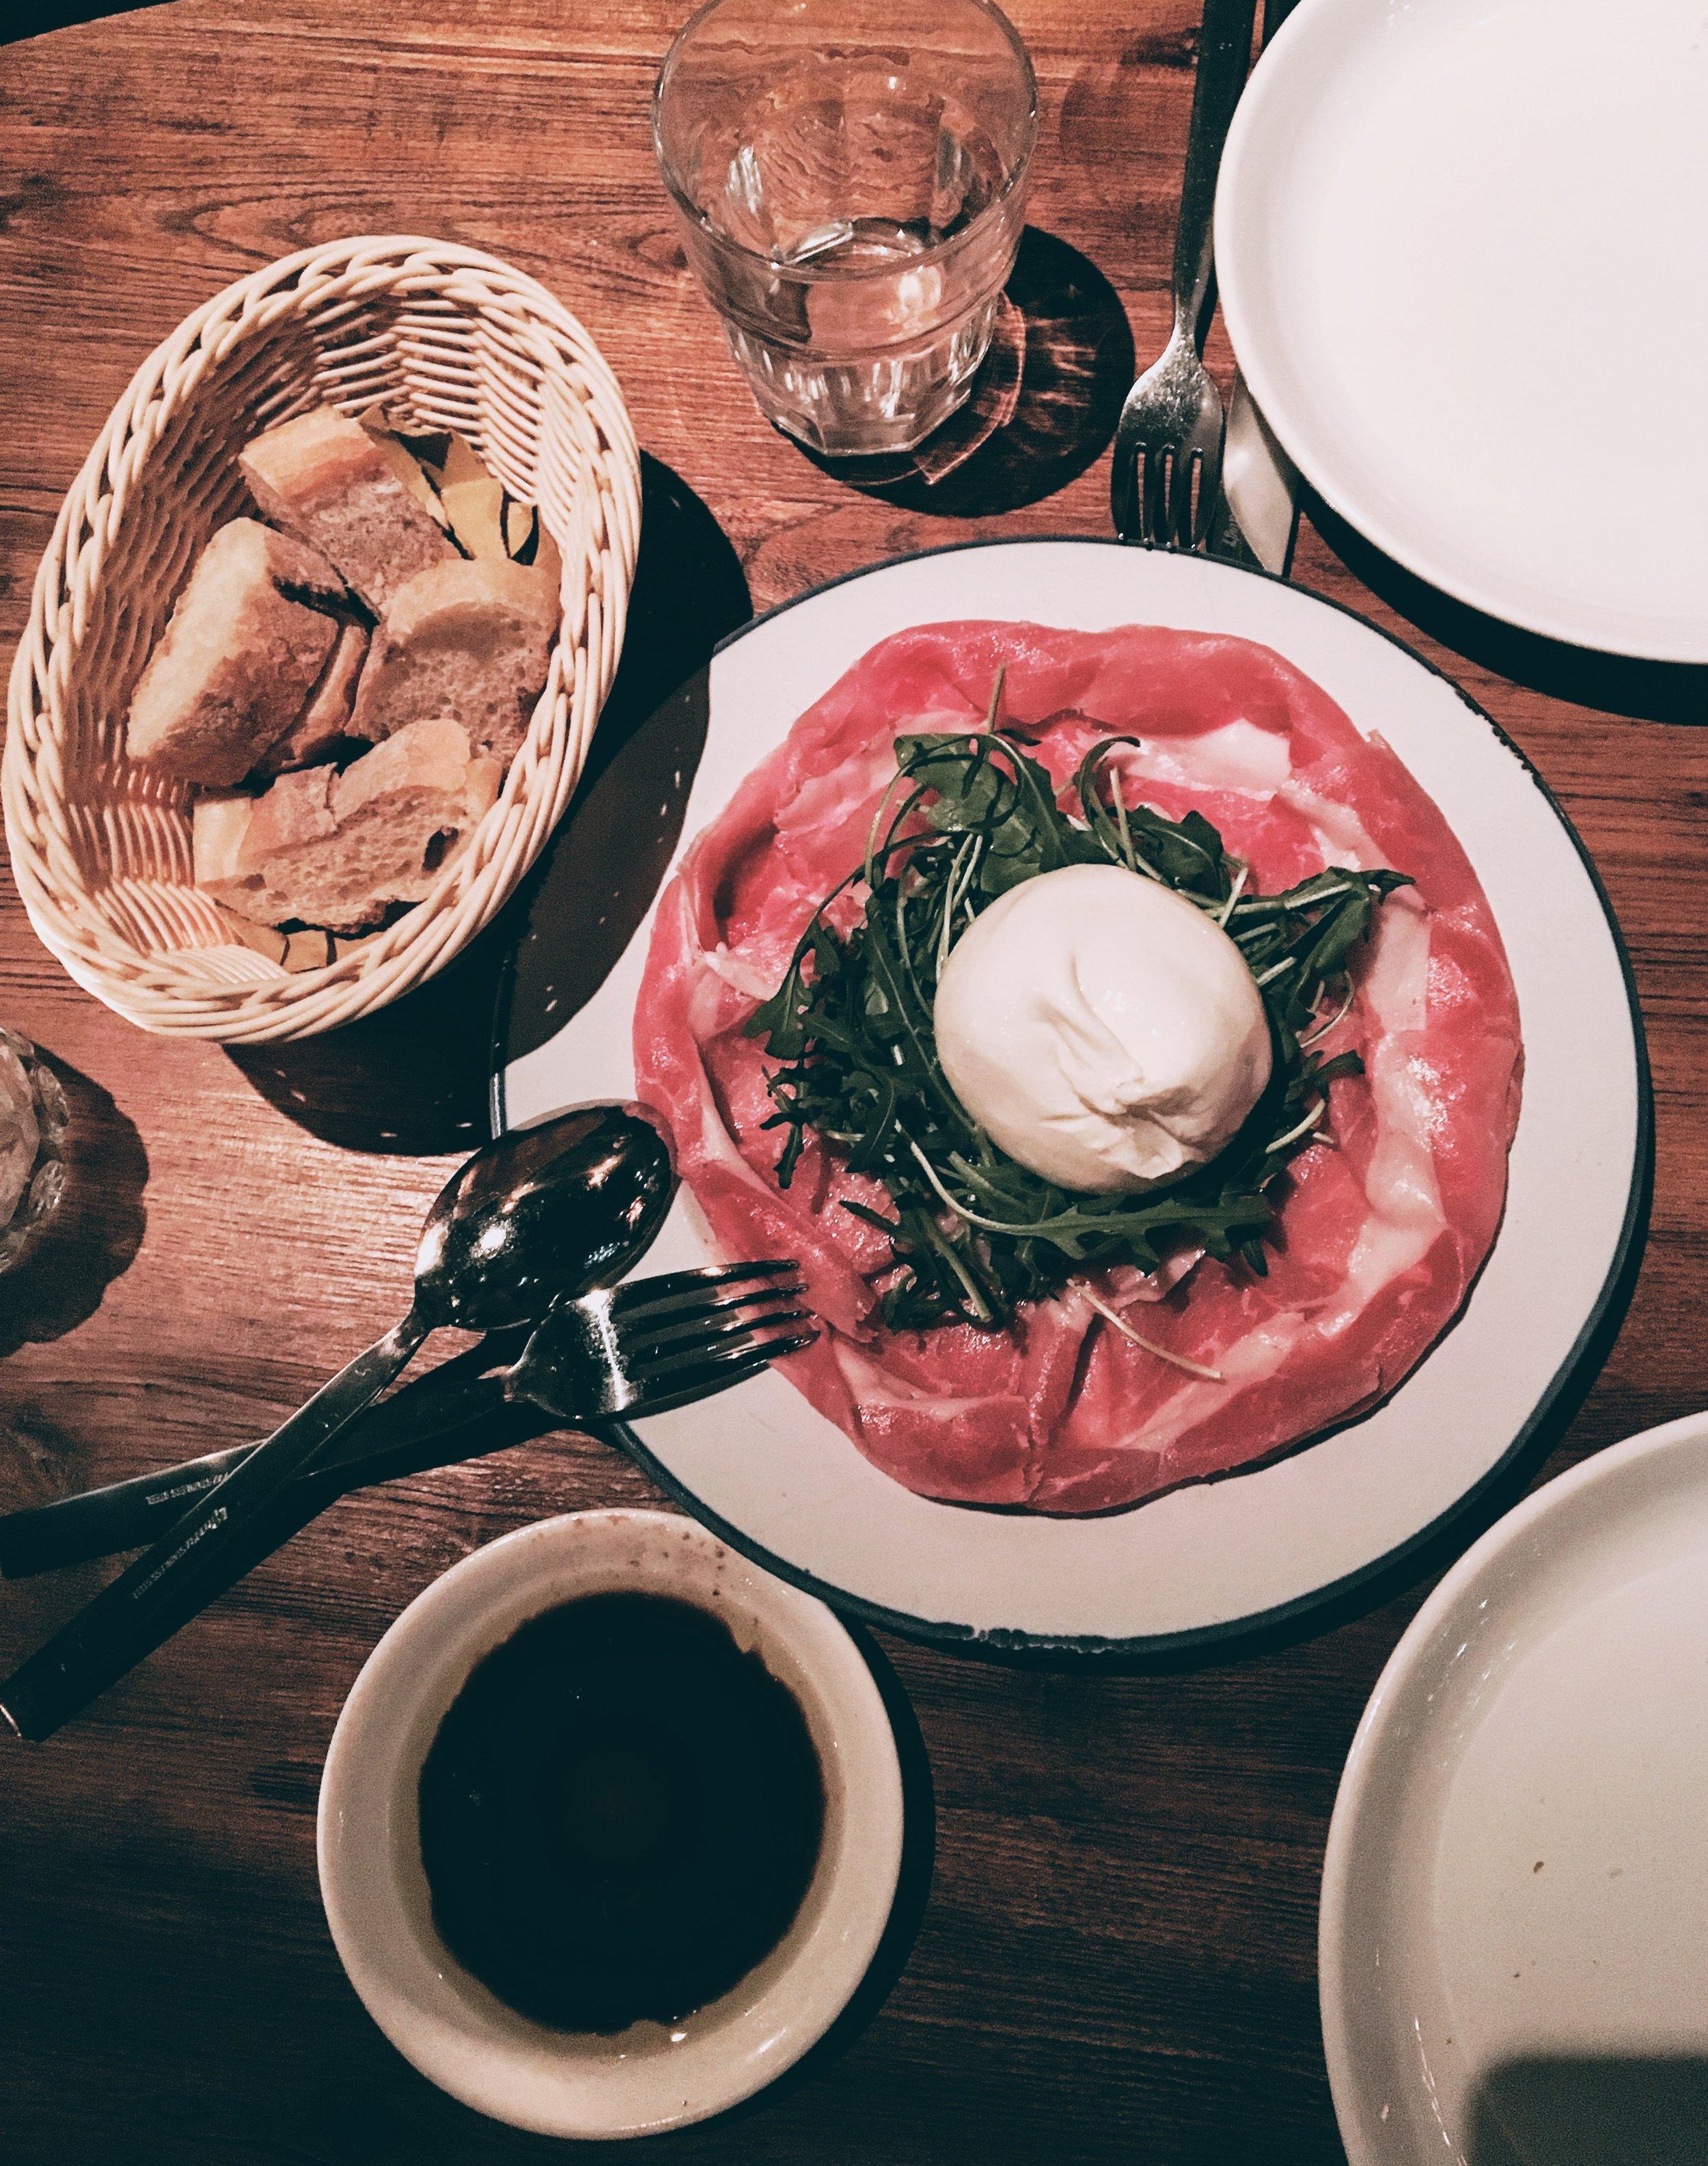 Italian Burratta and Parma Ham at Pirata, Wanchai